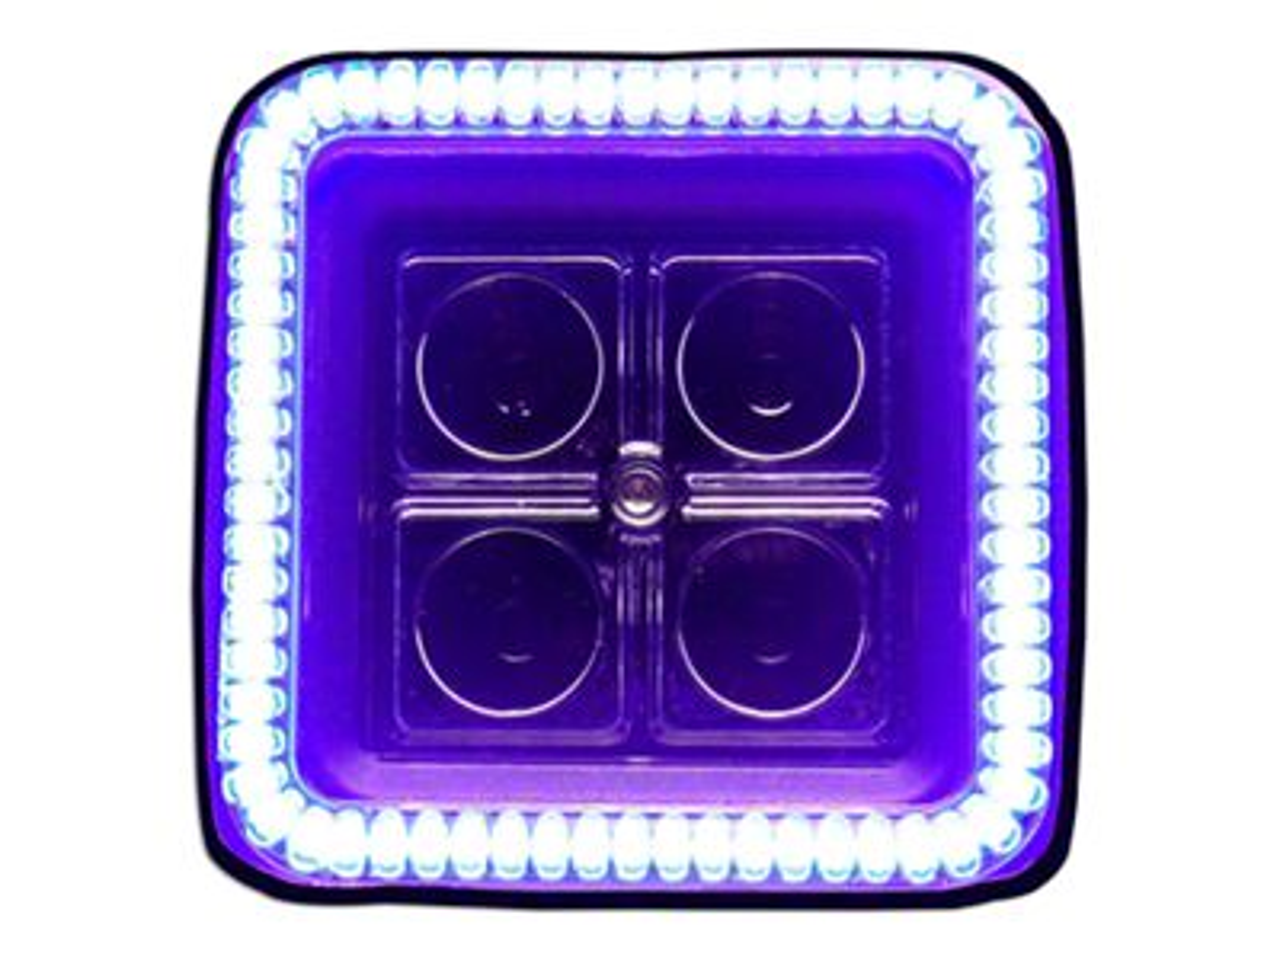 Oracle 3 in. Square Halo for Cube/Square Lights - UV/Purple (87-18 Jeep Wrangler YJ, TJ, JK & JL)